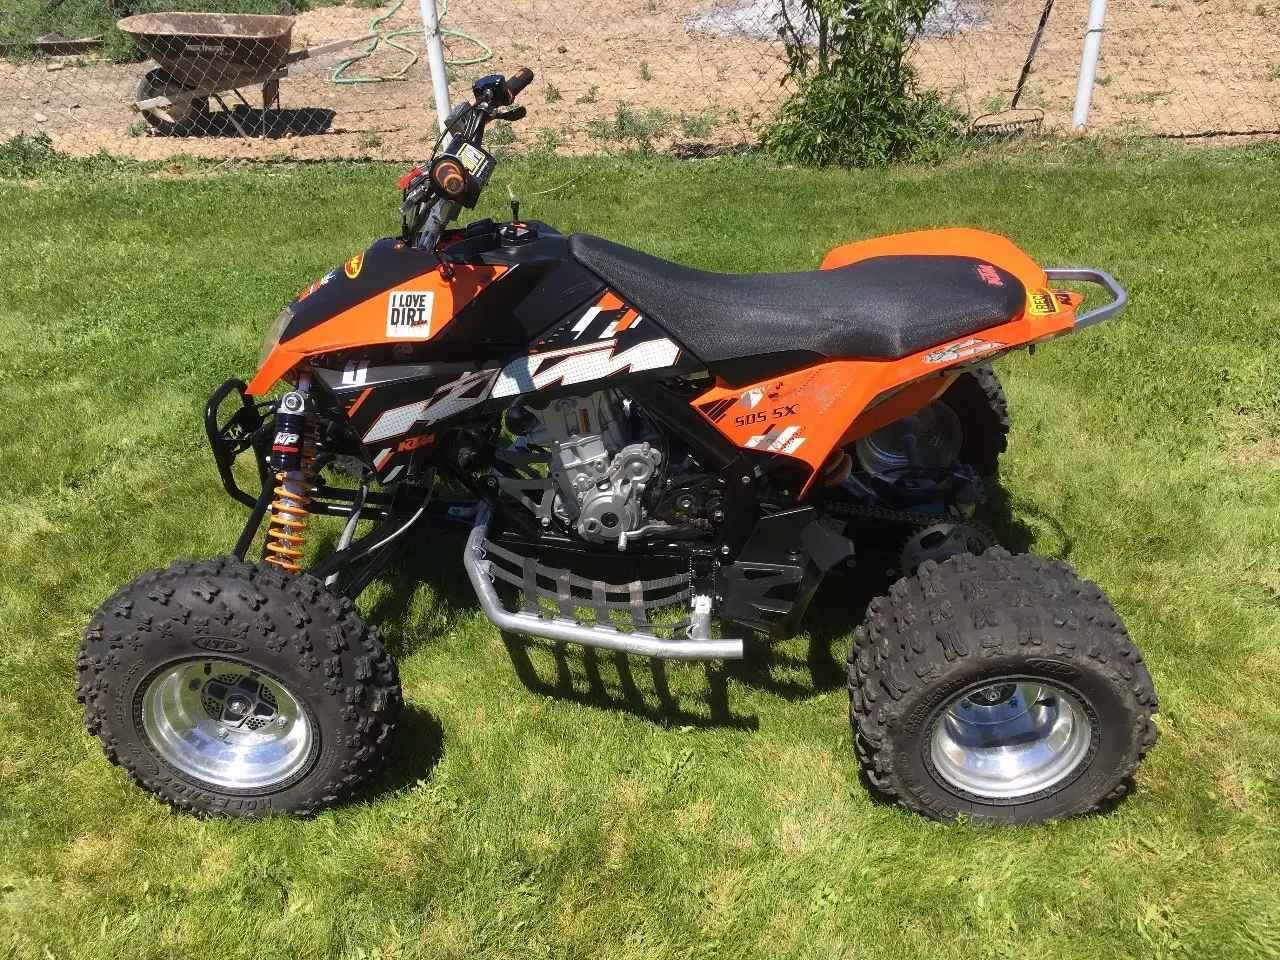 Used 2009 KTM 505 SX ATVs For Sale in Utah on ATV Trades